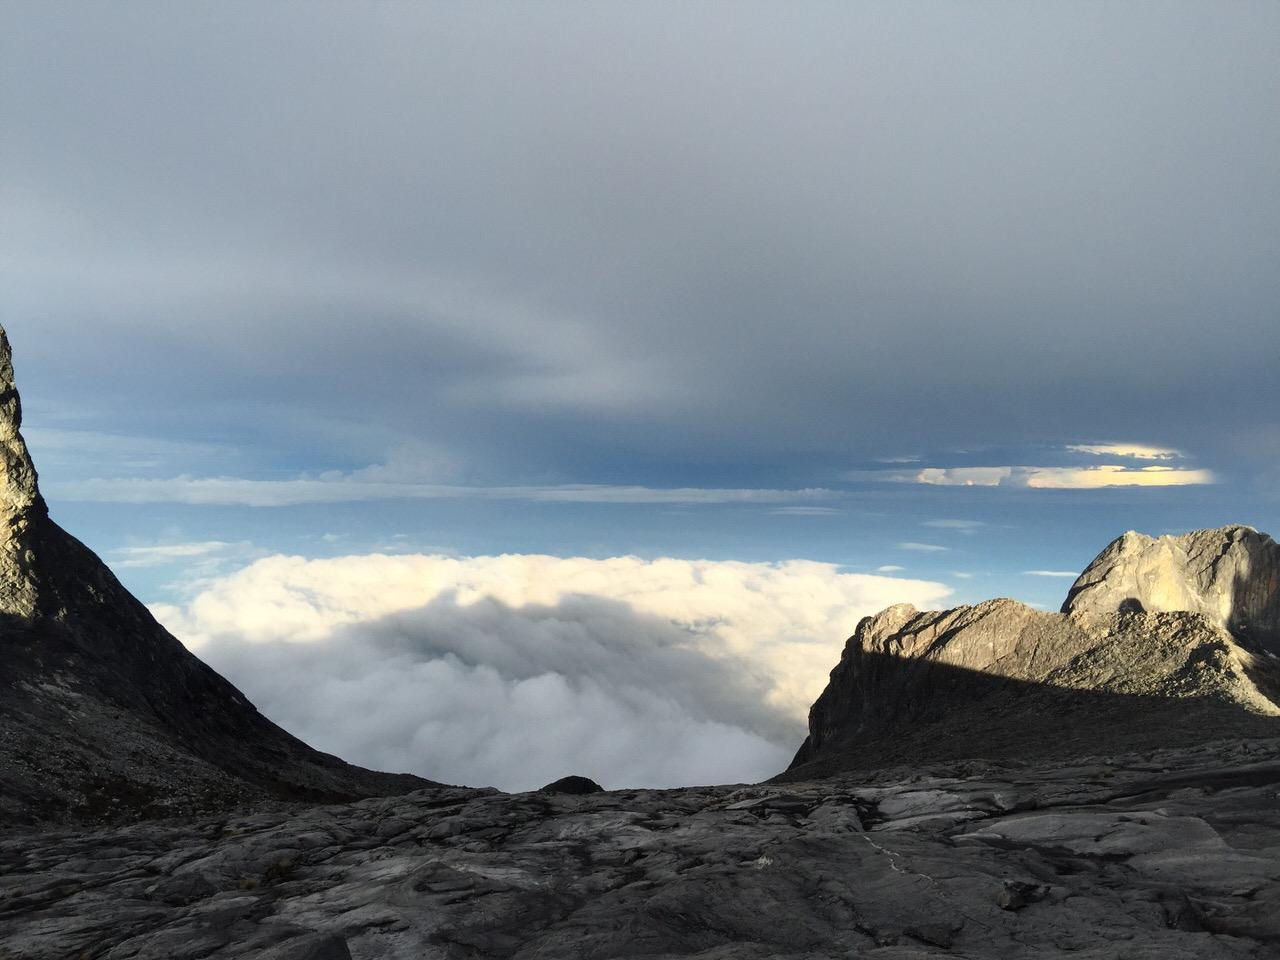 Kota Kinabalu climbing 4157